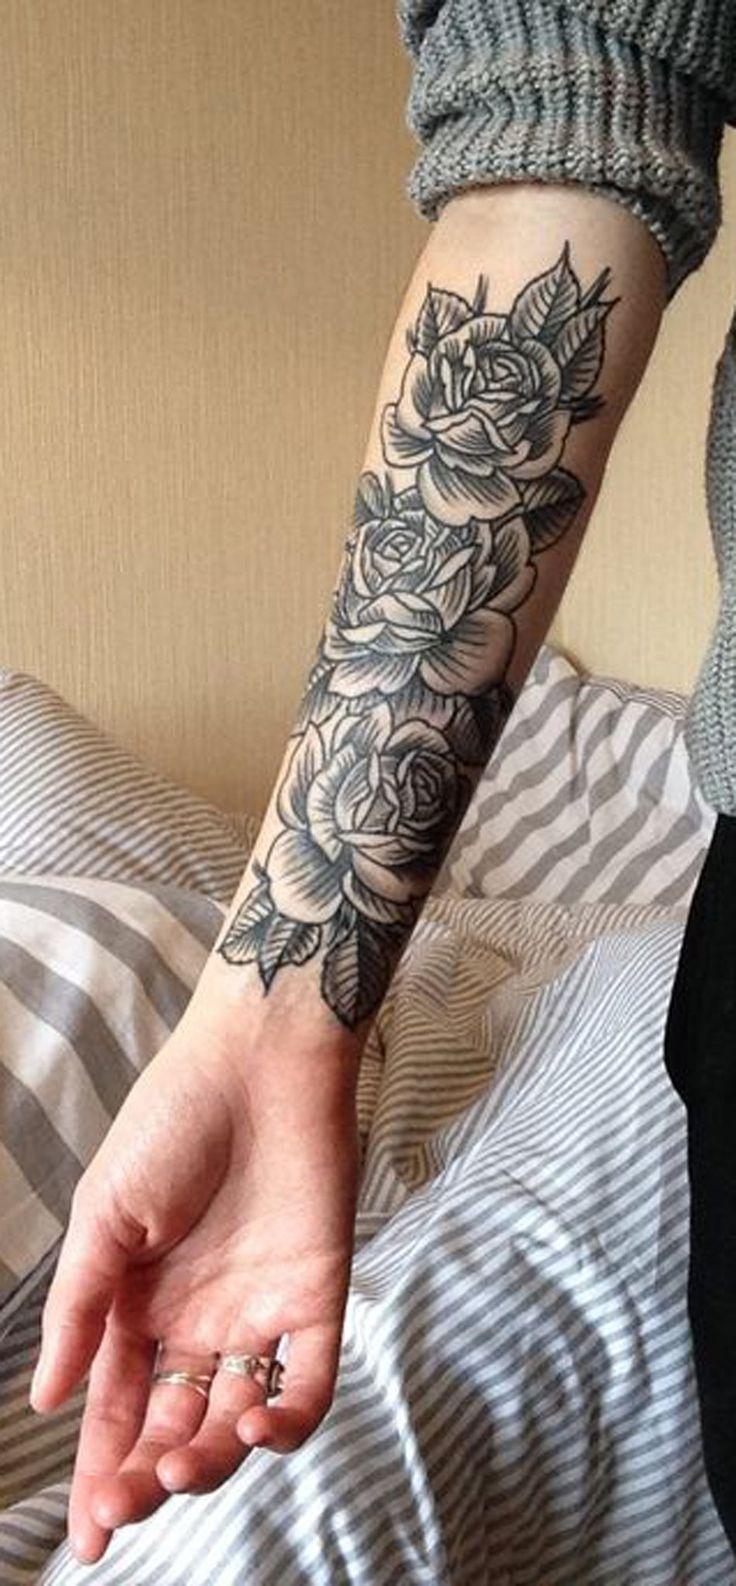 Black Rose Forearm Tattoo Ideas for Women Vintage